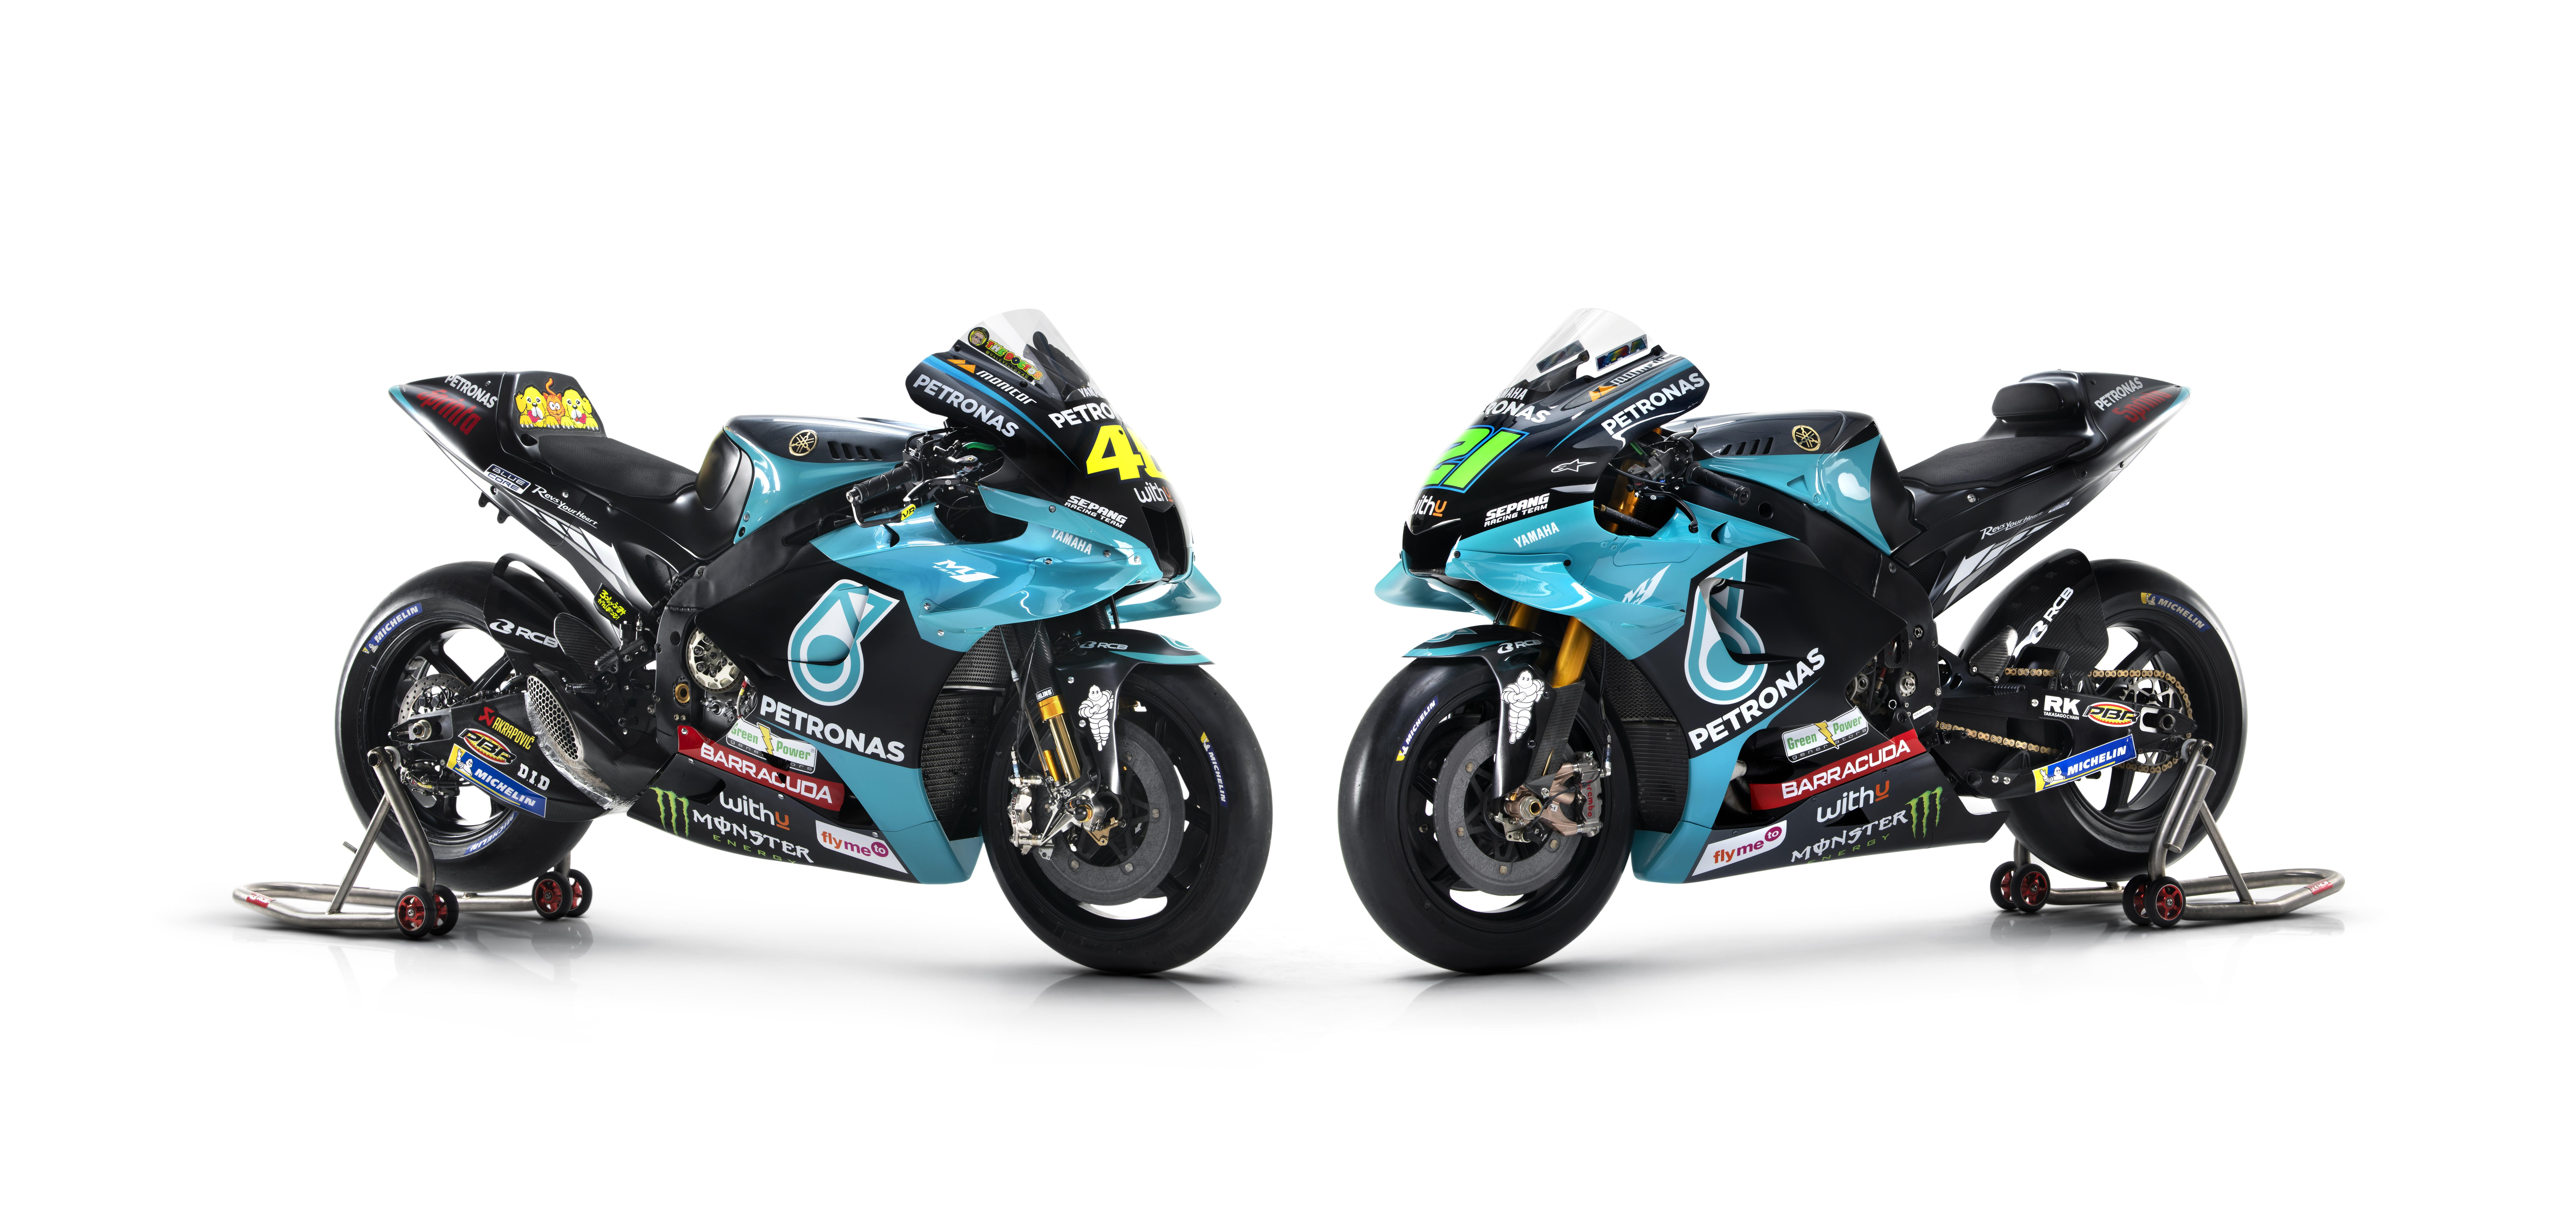 2021 MotoGP: Petronas Sepang Racing unveils racing livery – Valentino Rossi joins team with Morbidelli Image #1255990